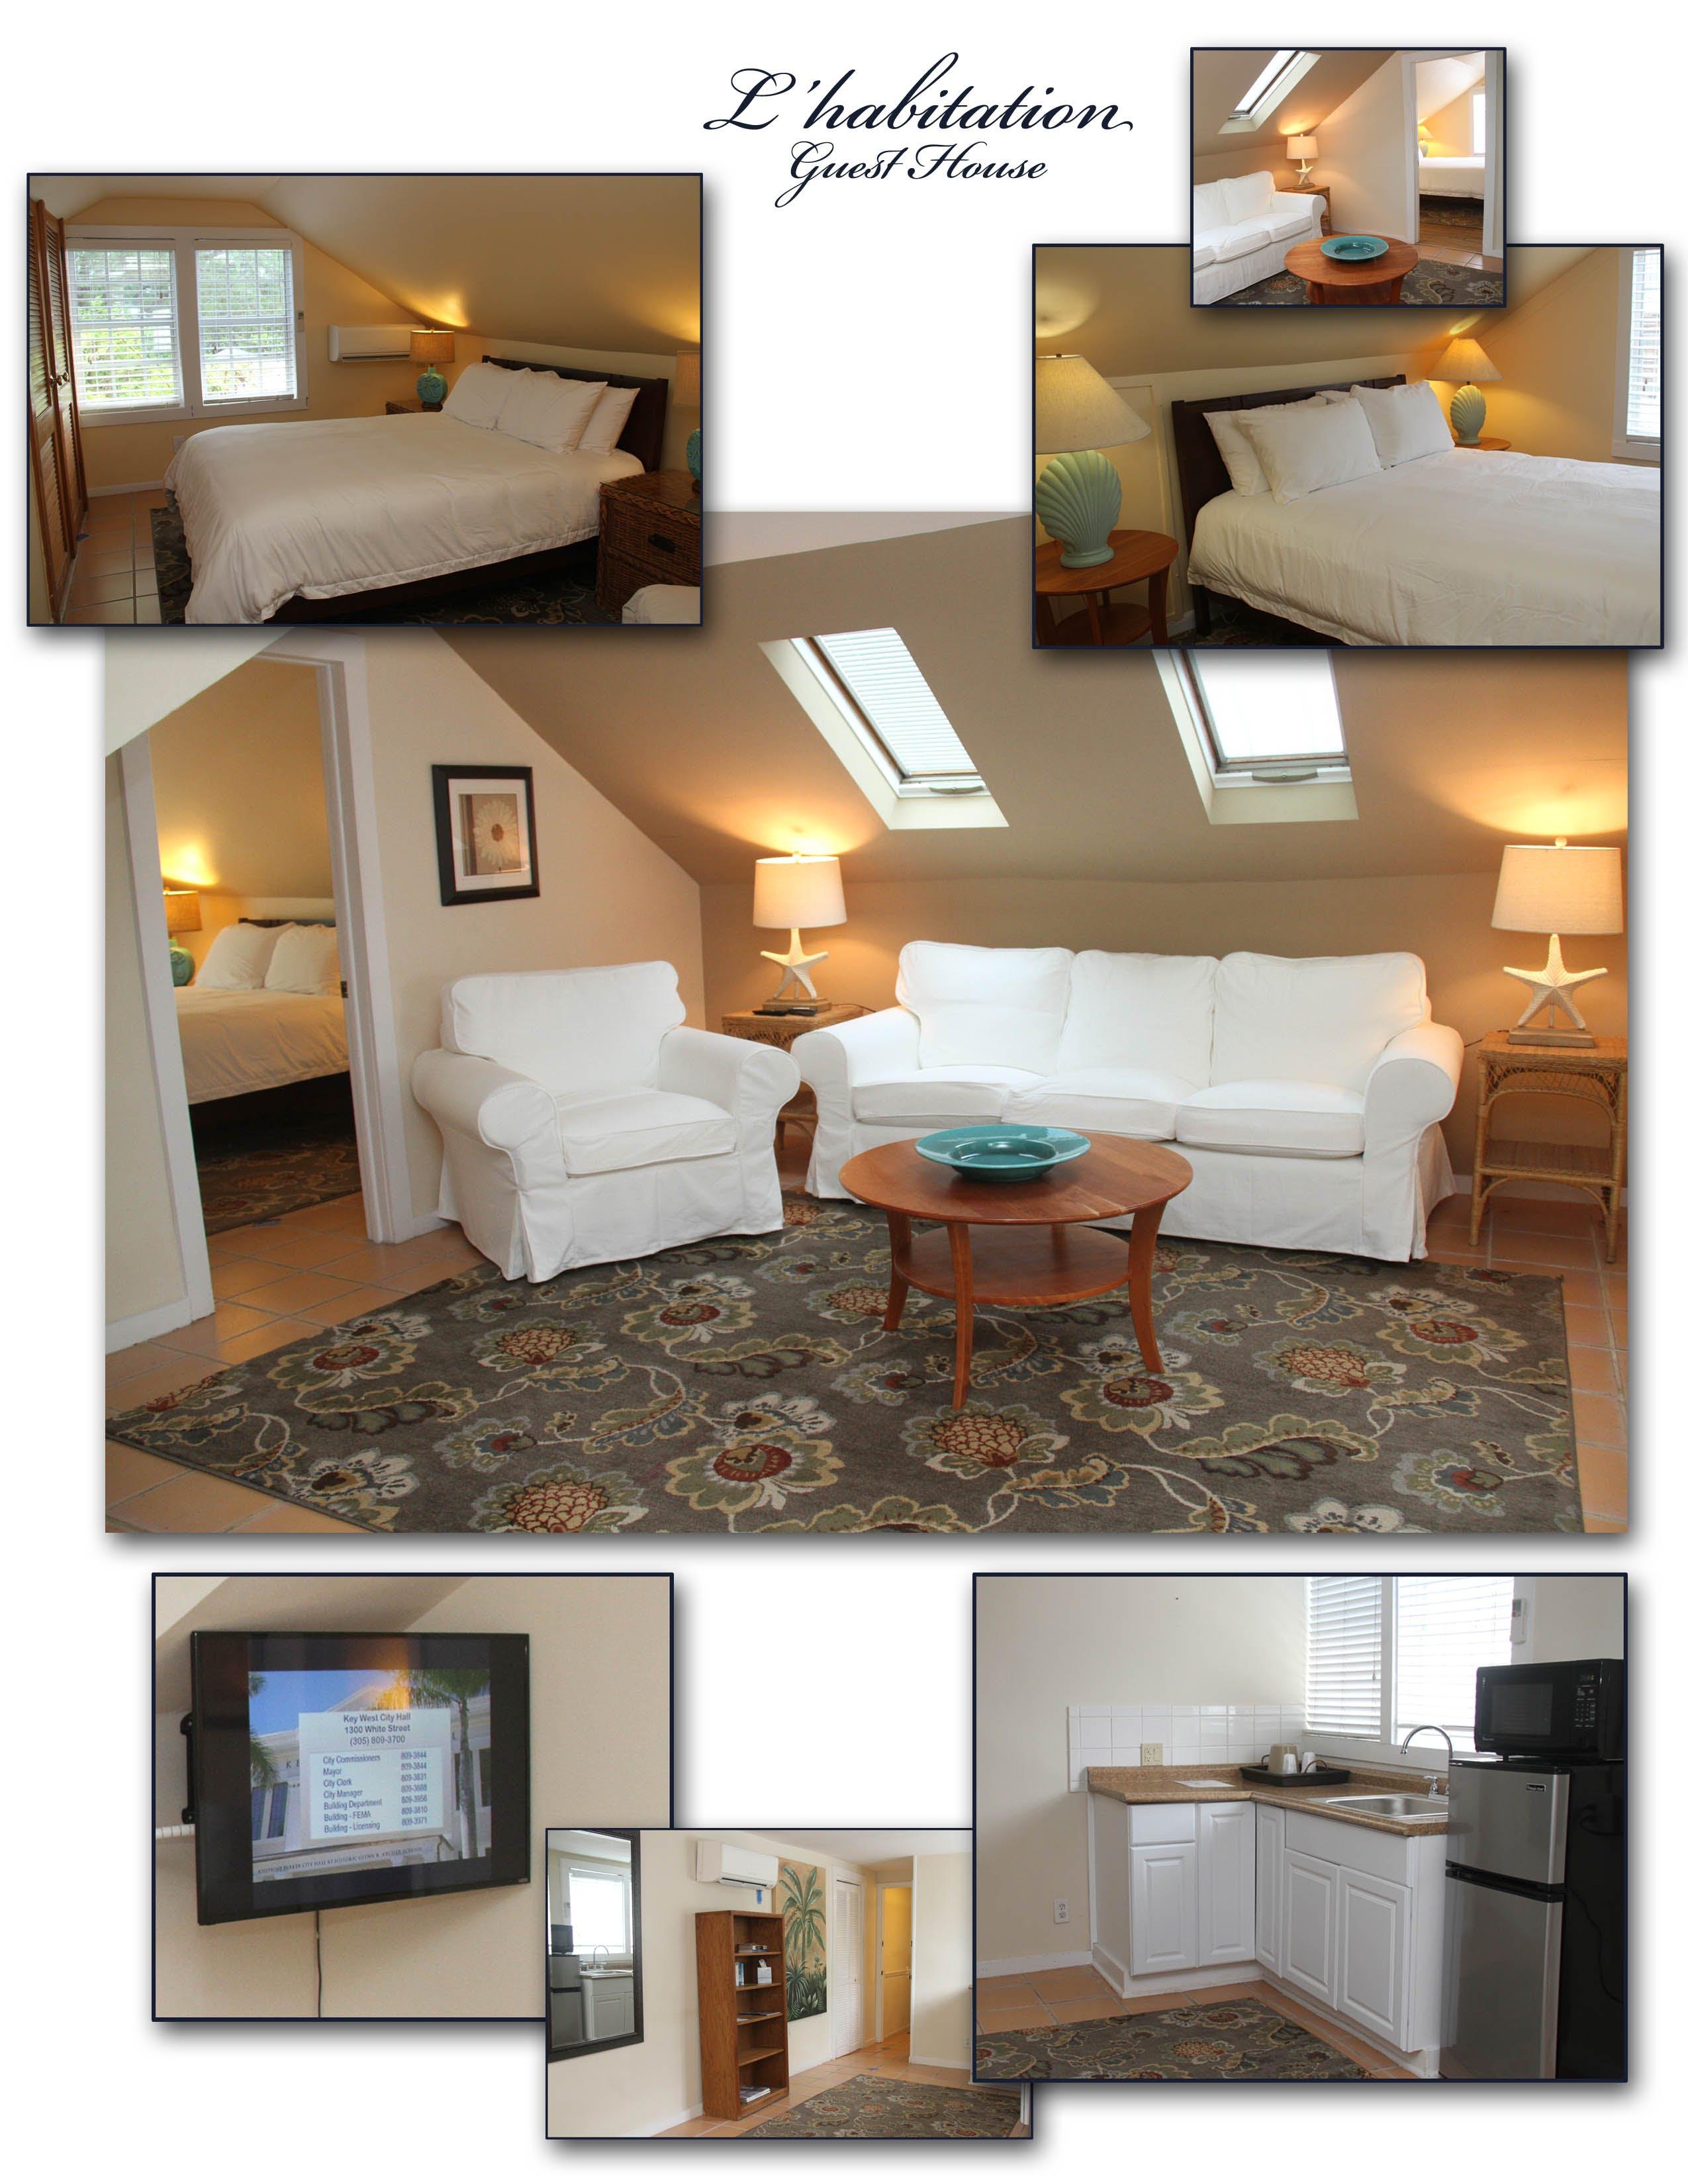 Two Bedroom Suite | L\' Habitation